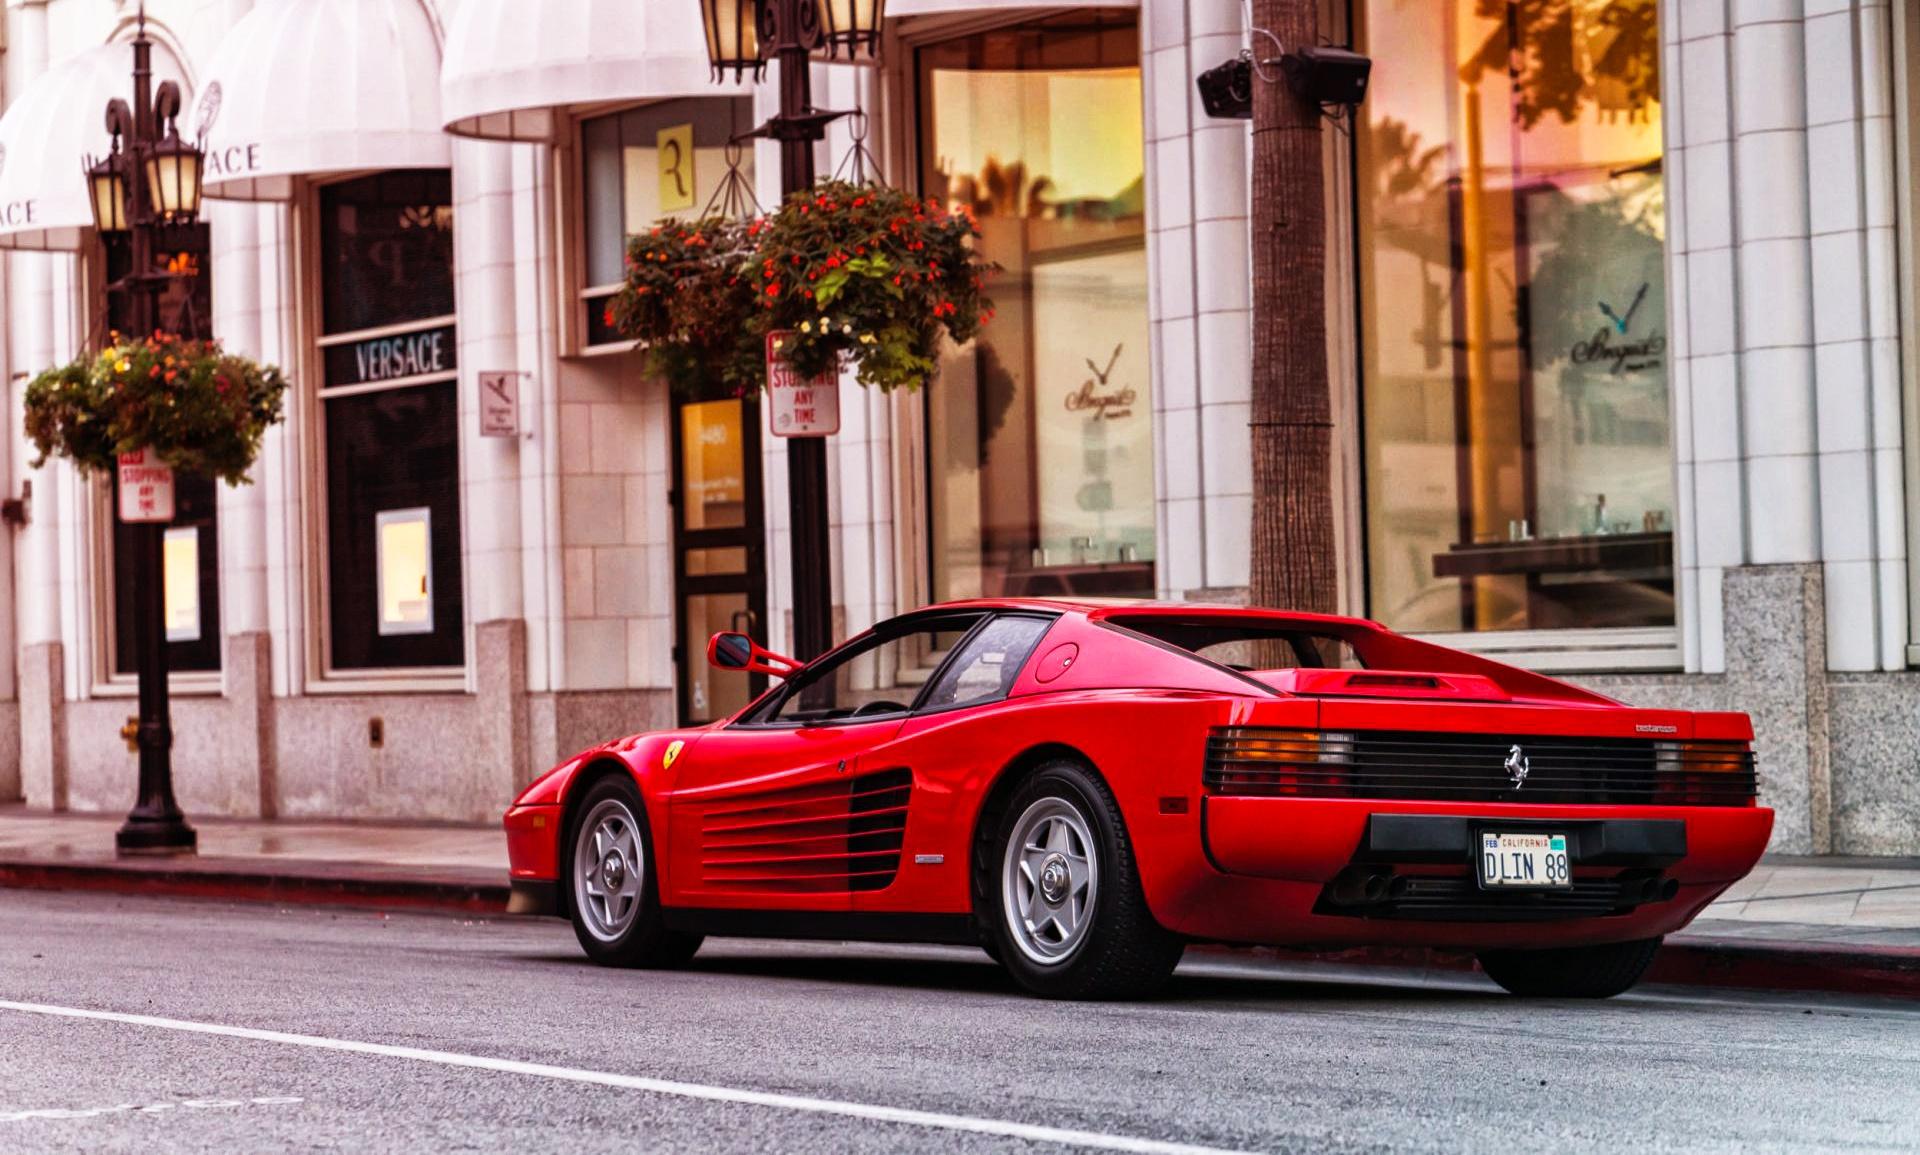 Wallpaper Car Vehicle Red Cars Ferrari Testarossa 1920x1155 Wallpapermaniac 1469893 Hd Wallpapers Wallhere